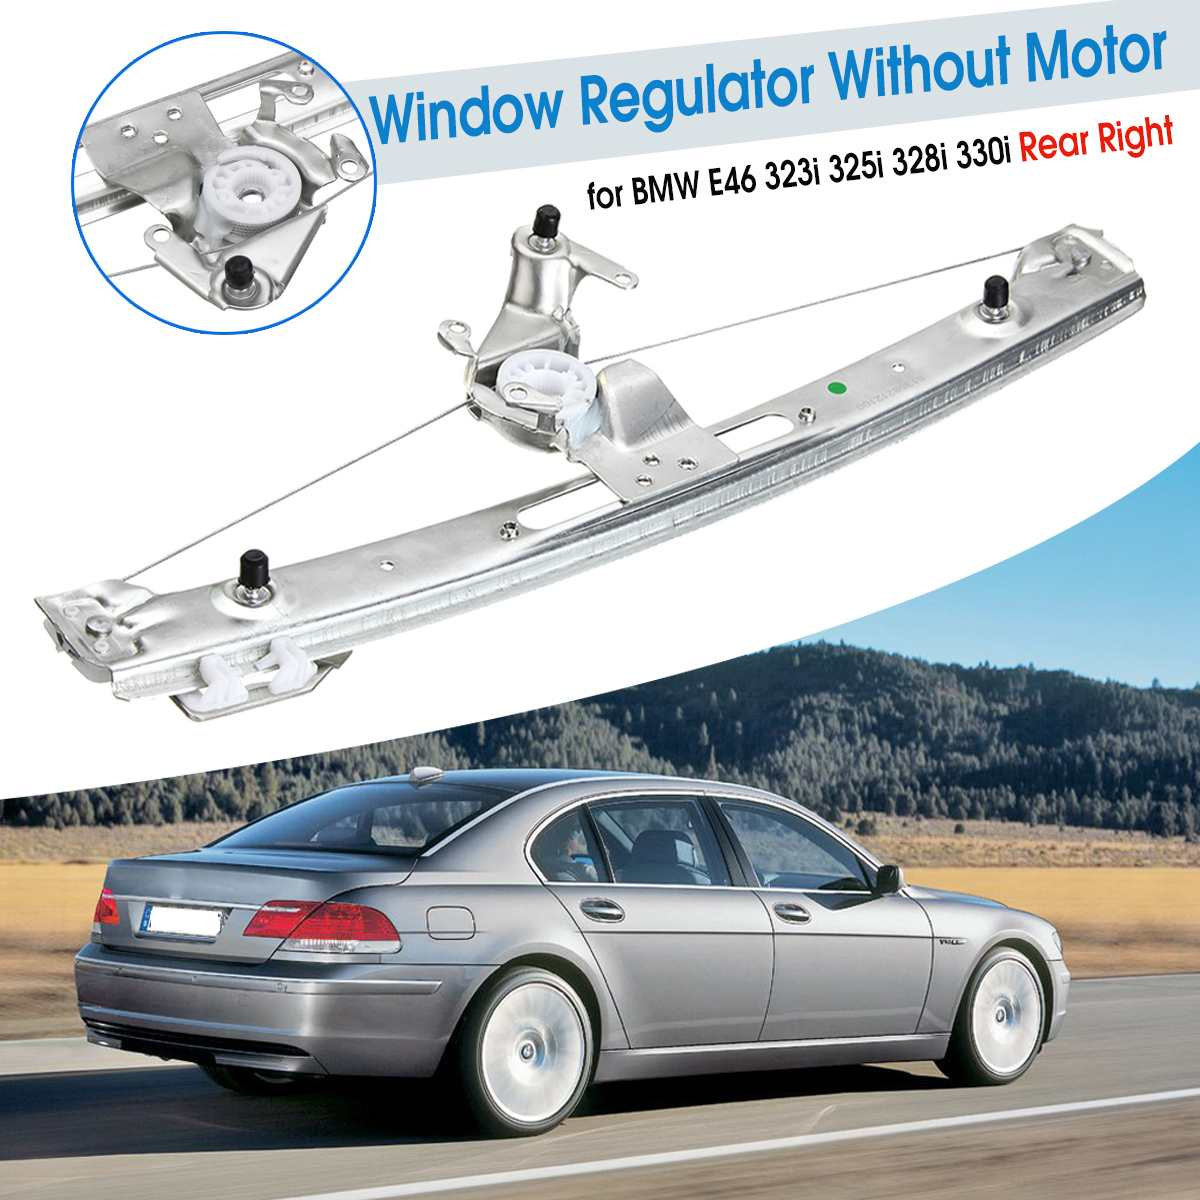 51358212100 hinten Rechts Power Fensterheber Für BMW E46 323i 325i 328i 330i 1999 2000 2001 2002 2003 2004 2005 ohne Motor